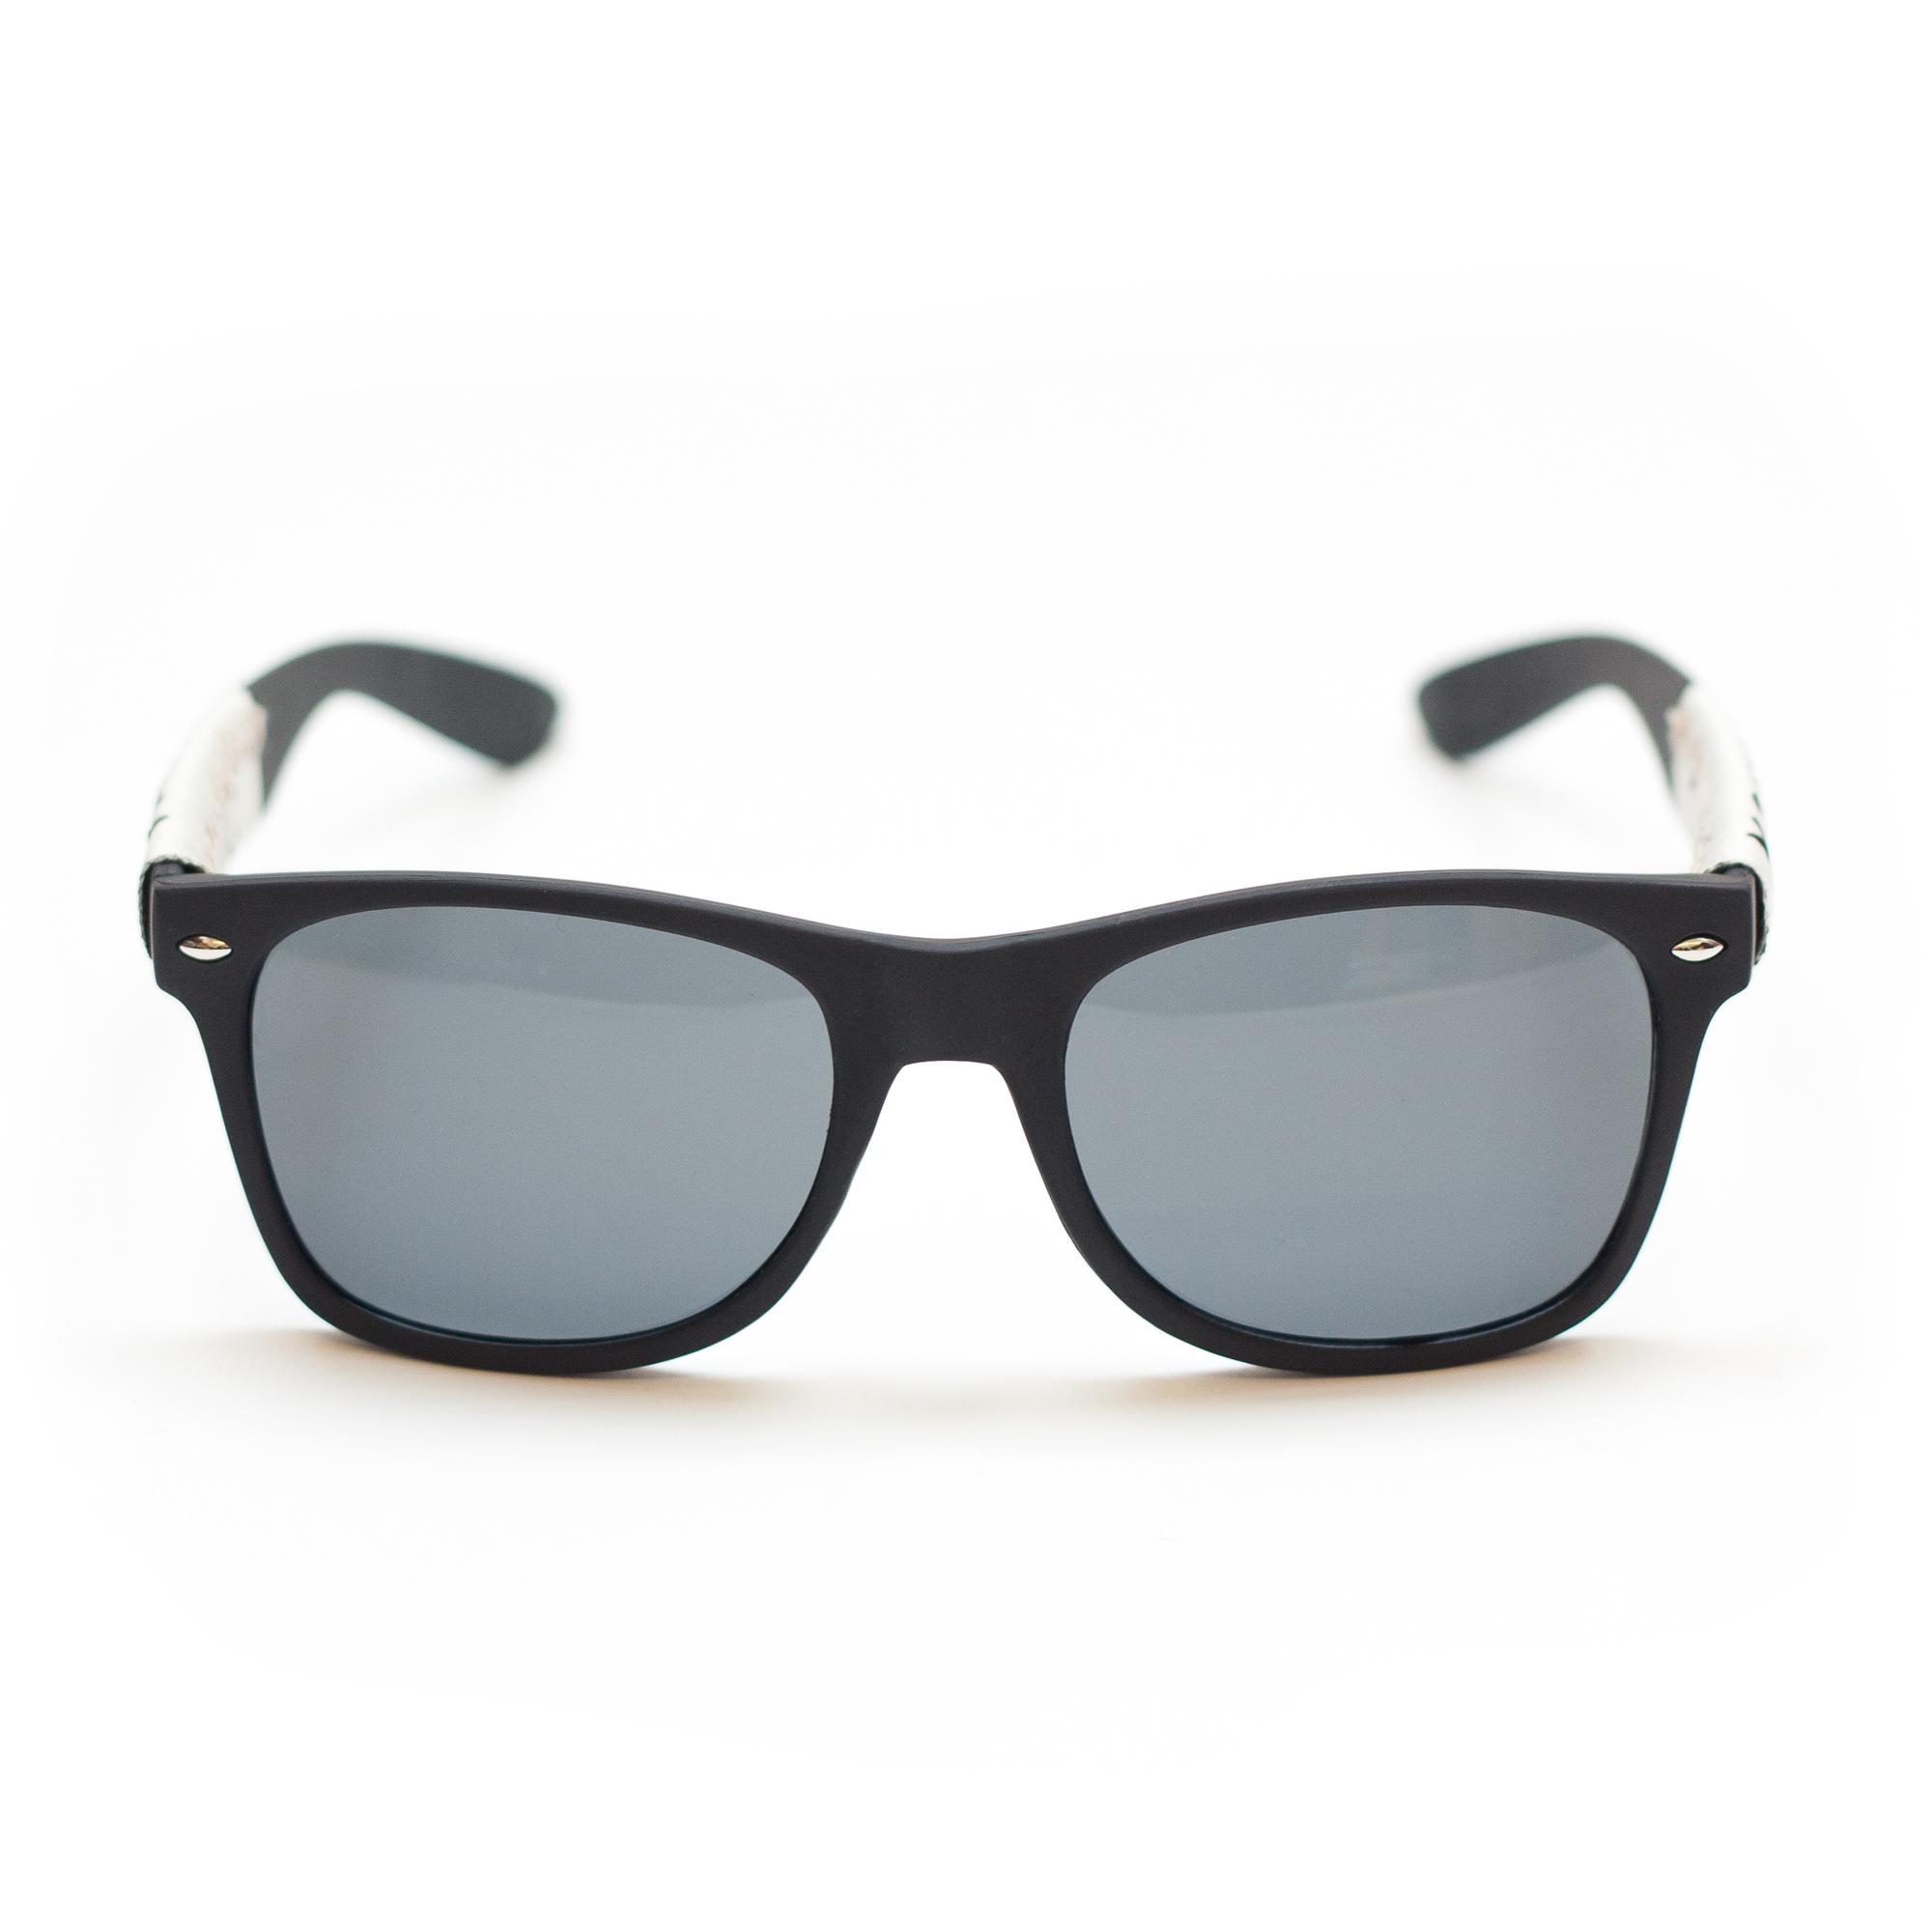 One Nature Sunglasses - 5